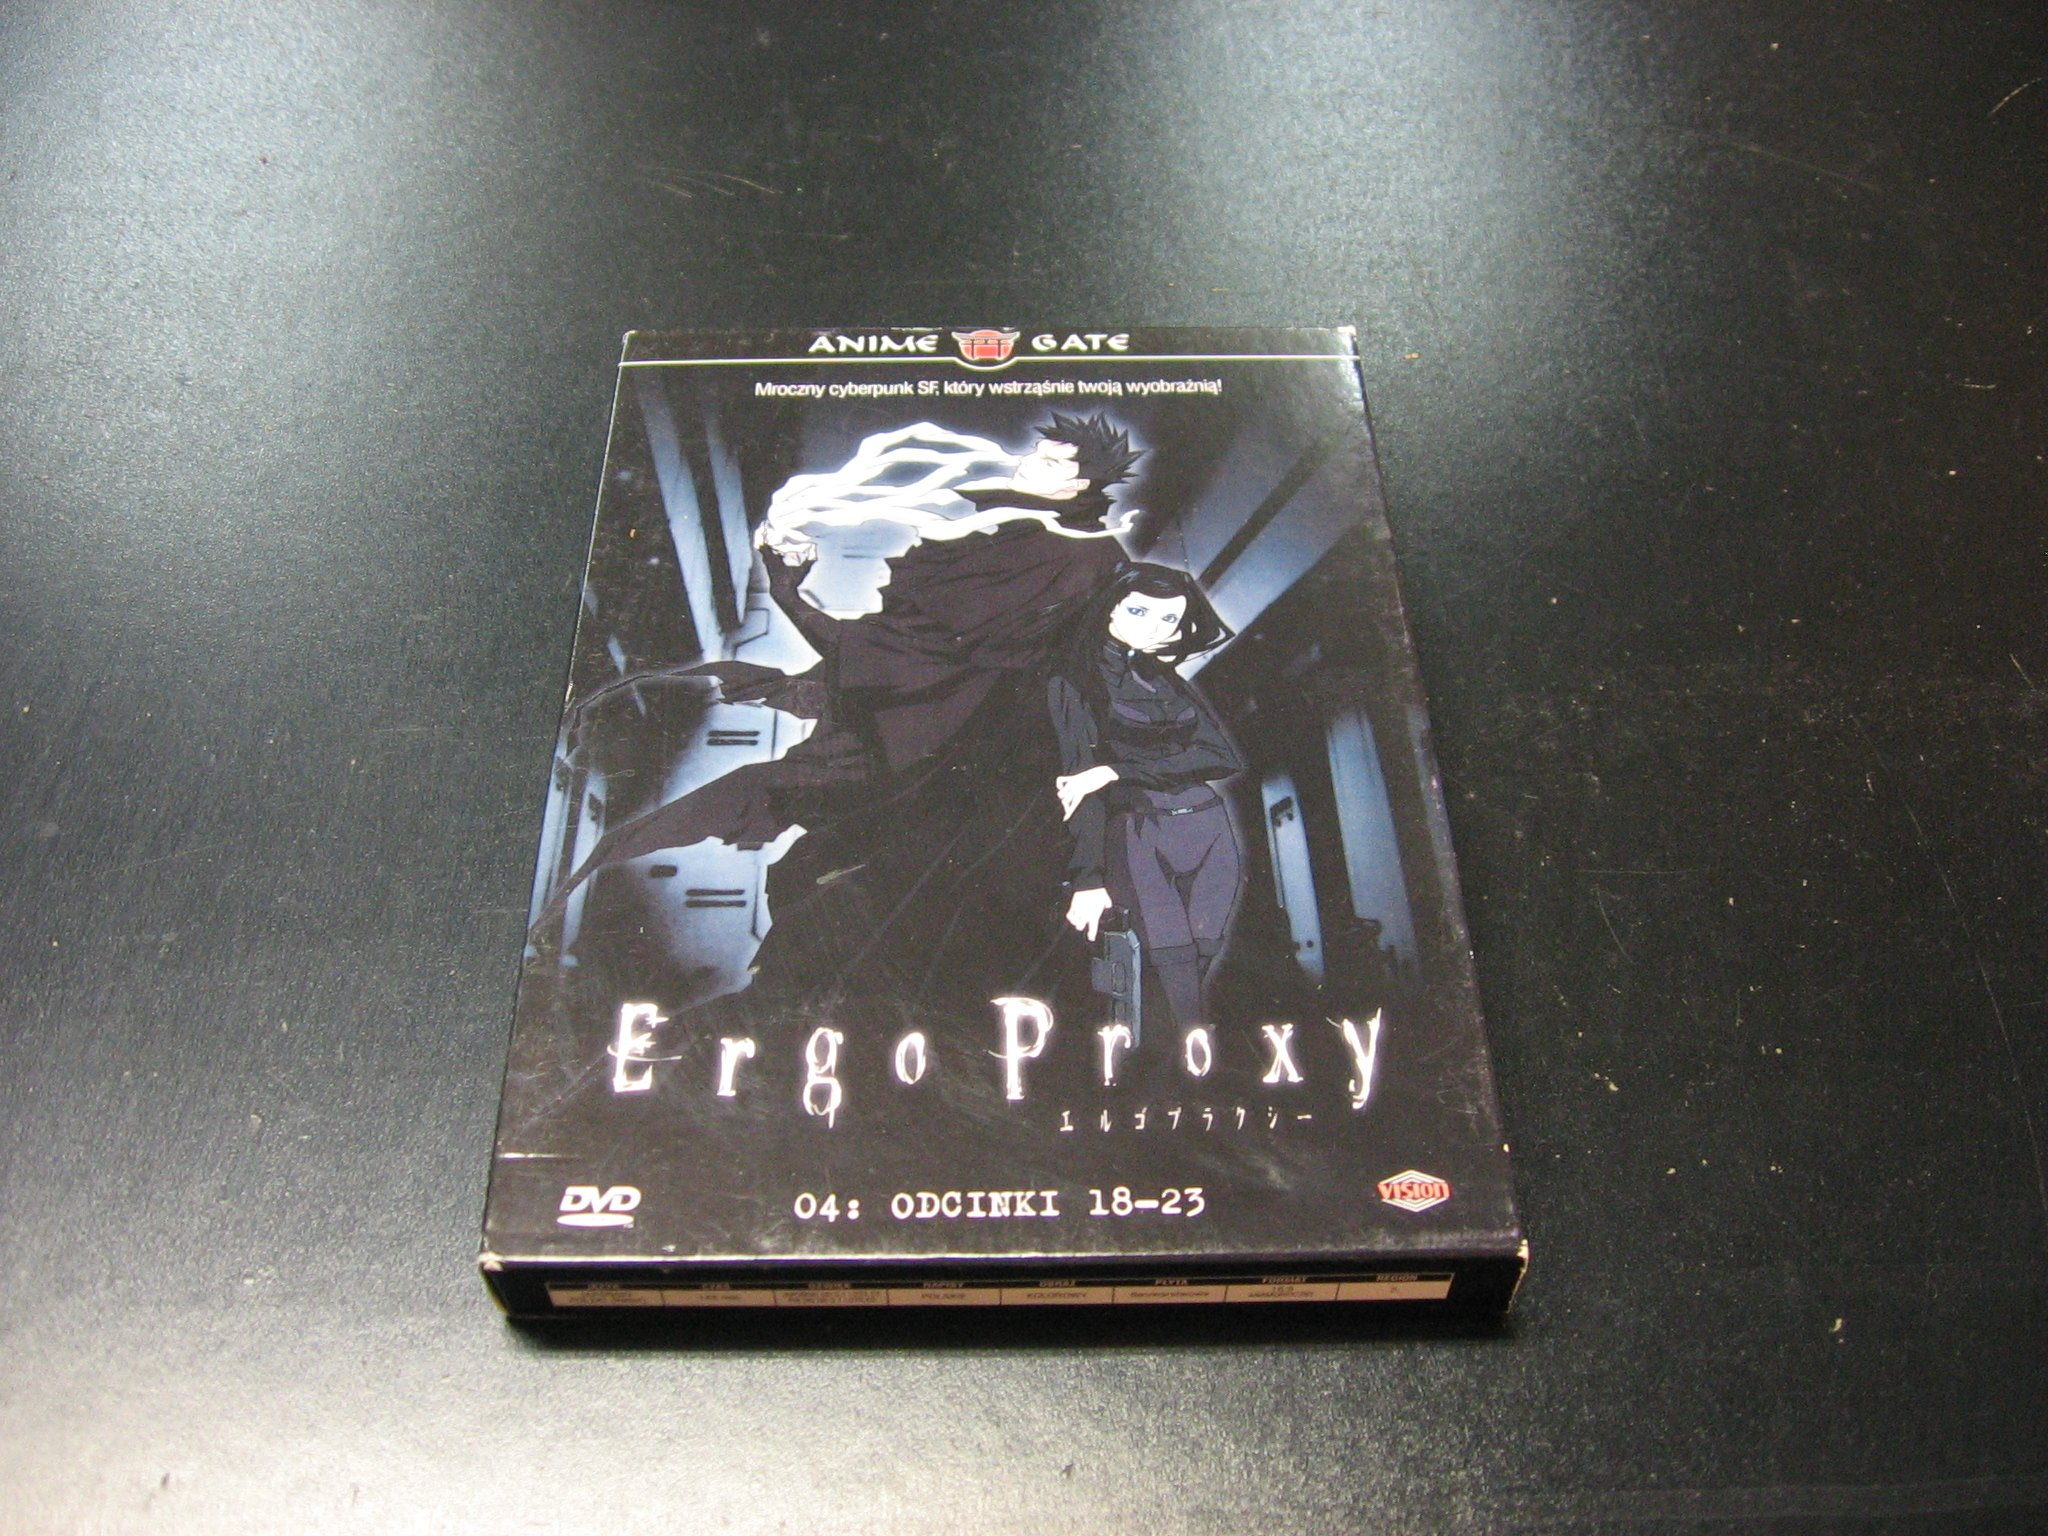 ERGO PROXY odcinki 18-23 polski LEKTOR DVD Sklep Opole